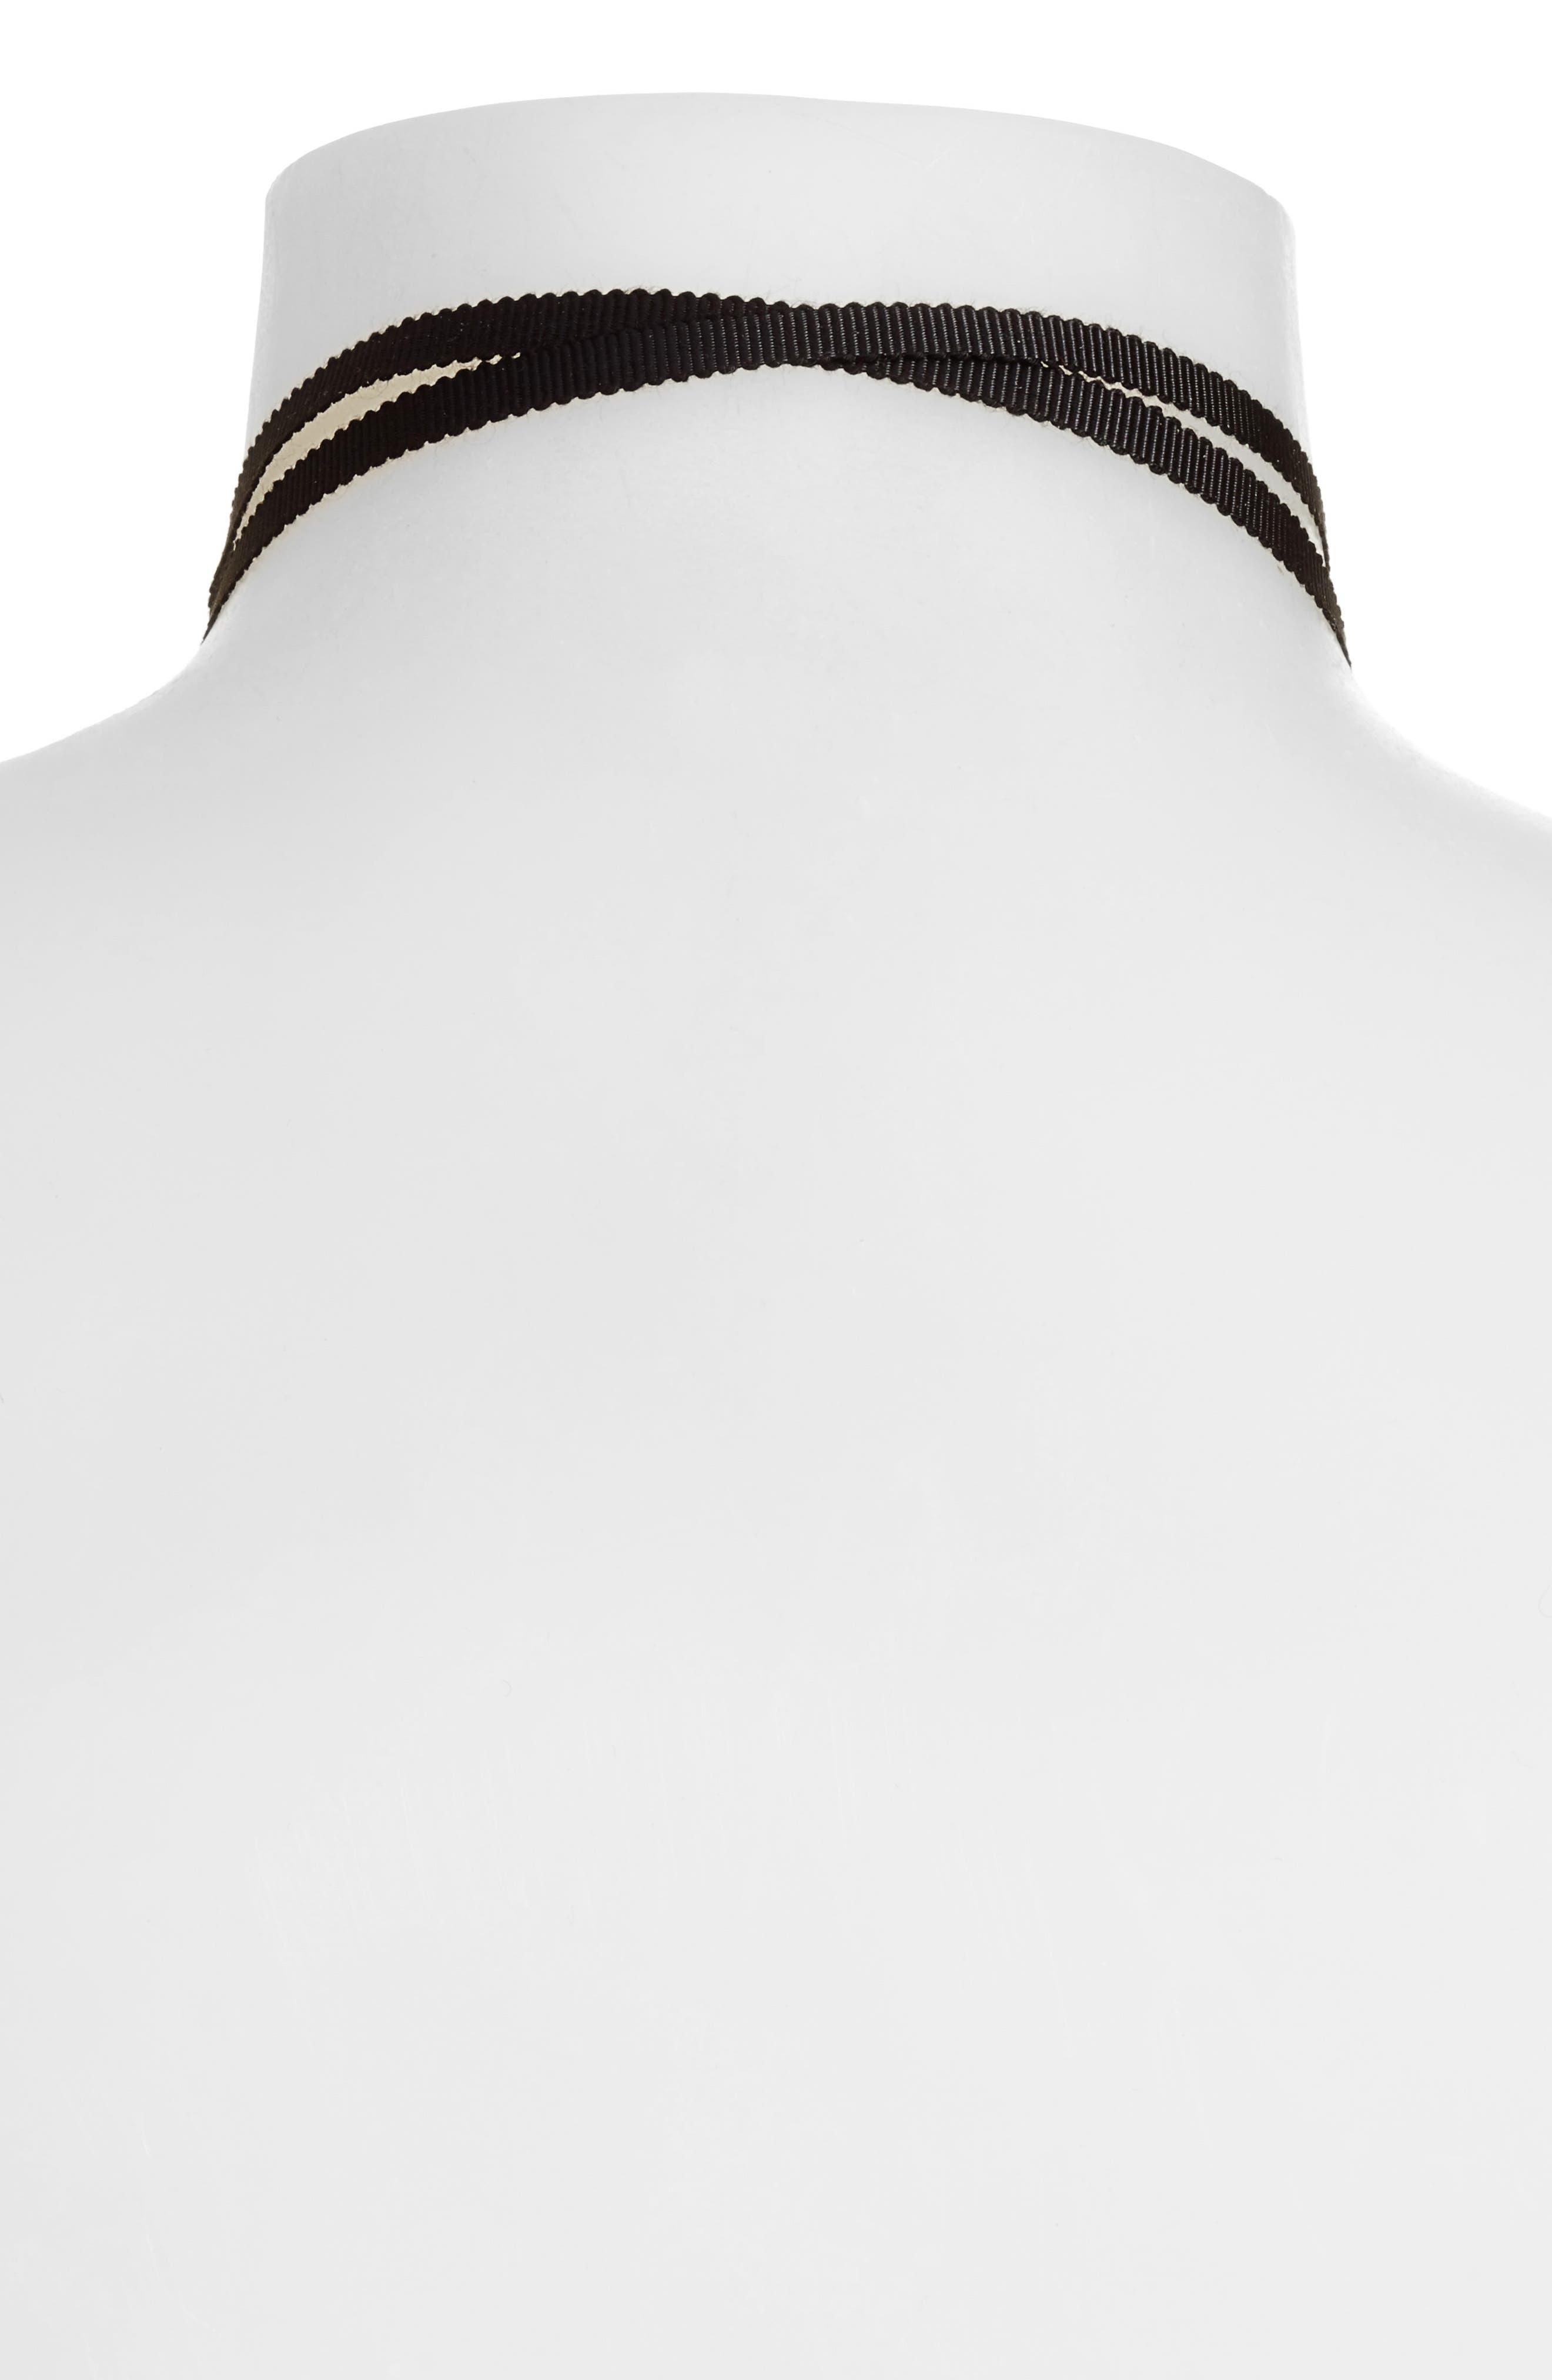 Tie Choker Necklace,                             Alternate thumbnail 6, color,